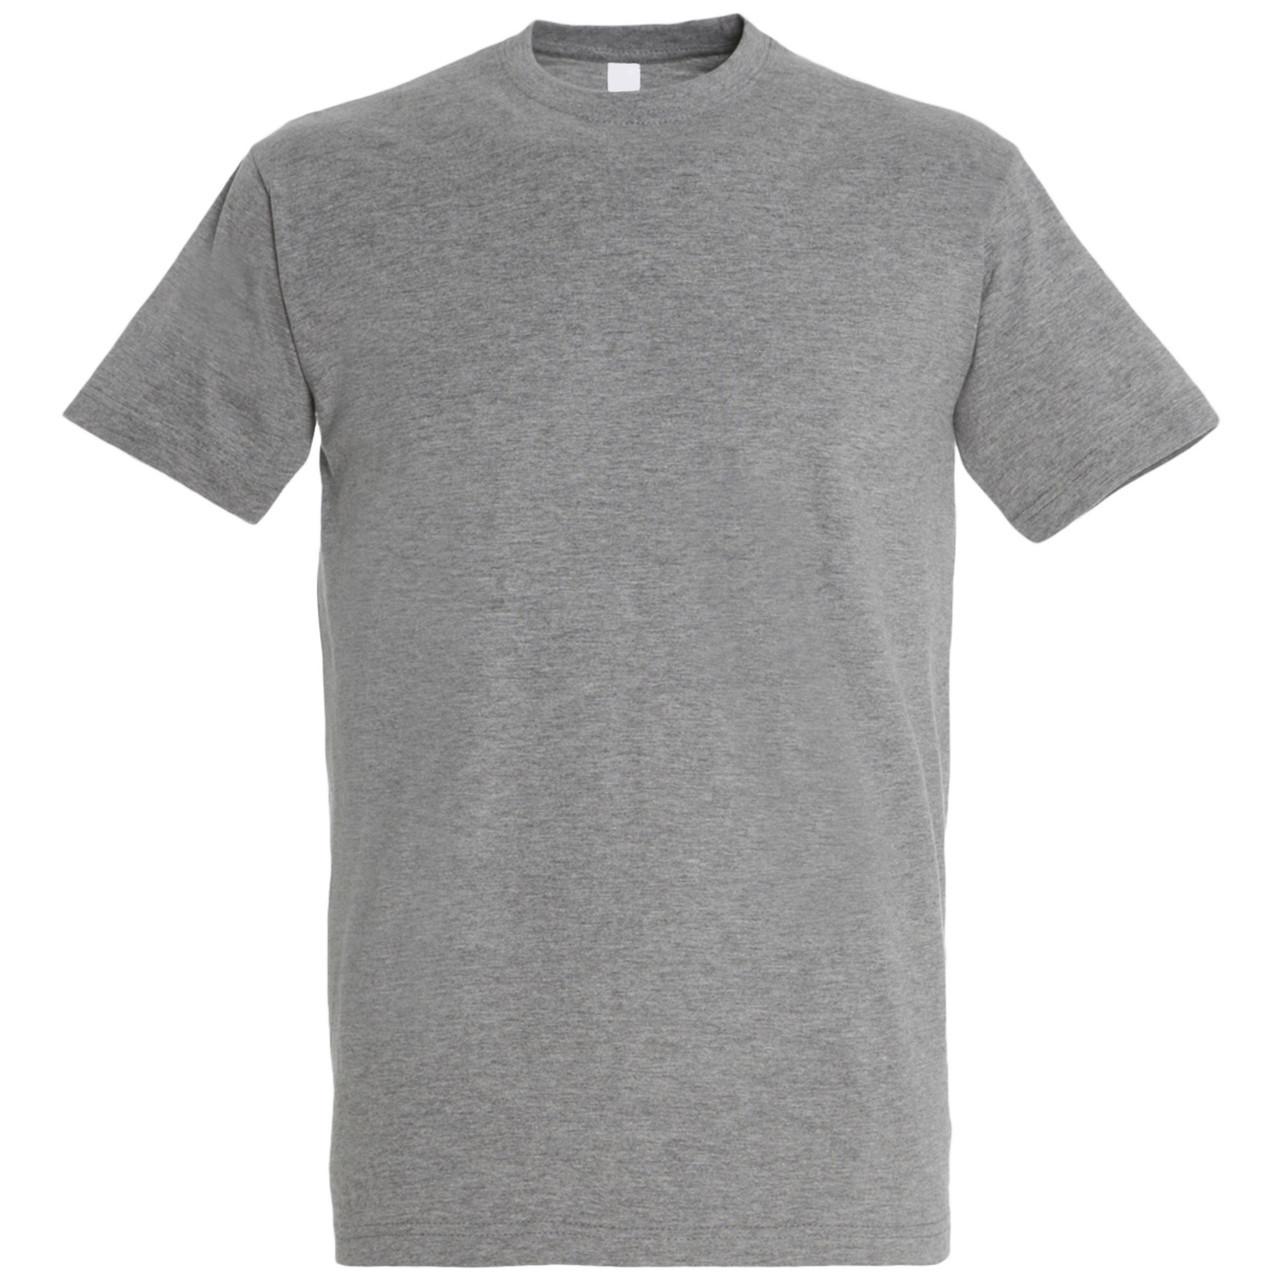 Oднотонная футболка   Серый меланж   160 гр.   S